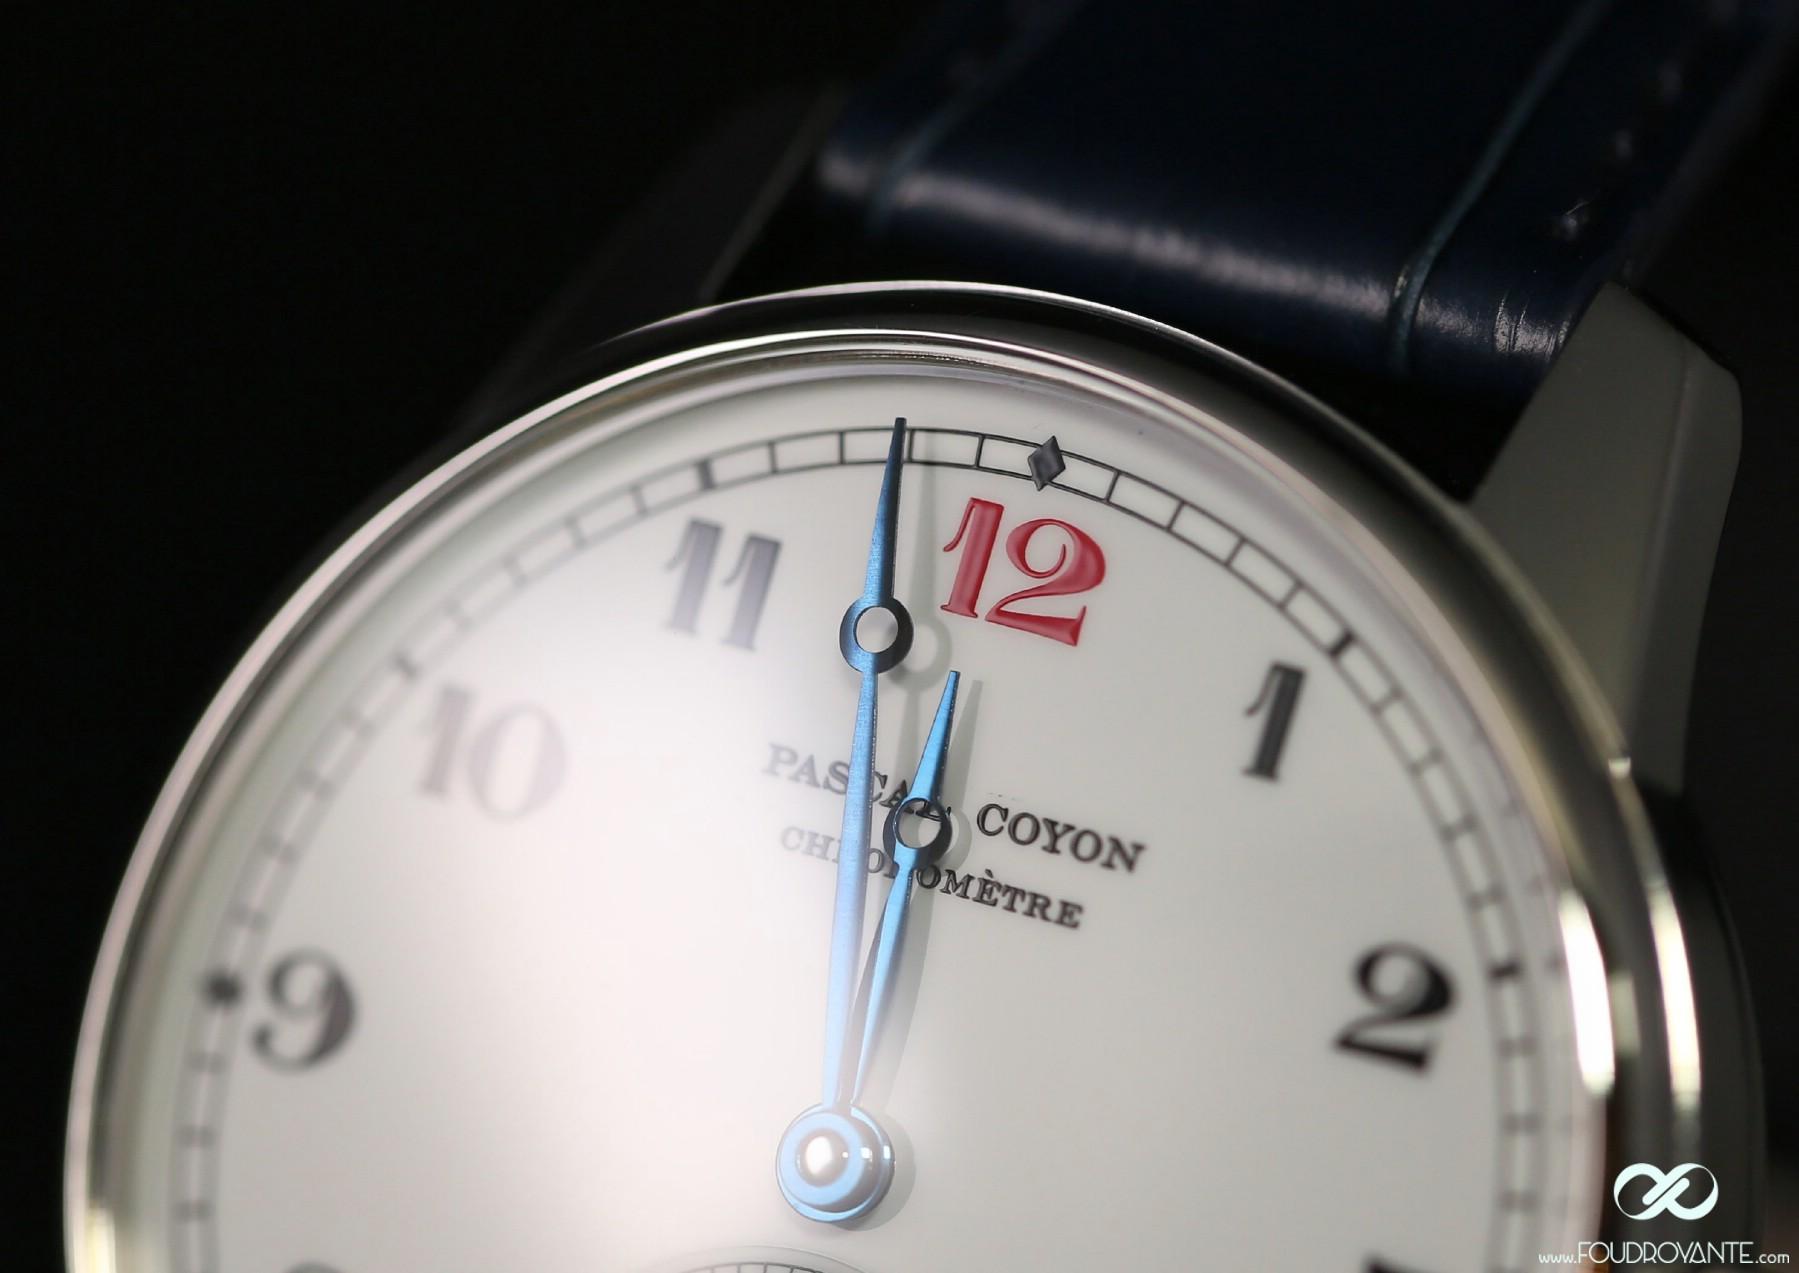 Pascal Coyon Chronomètre 1900 C (2)